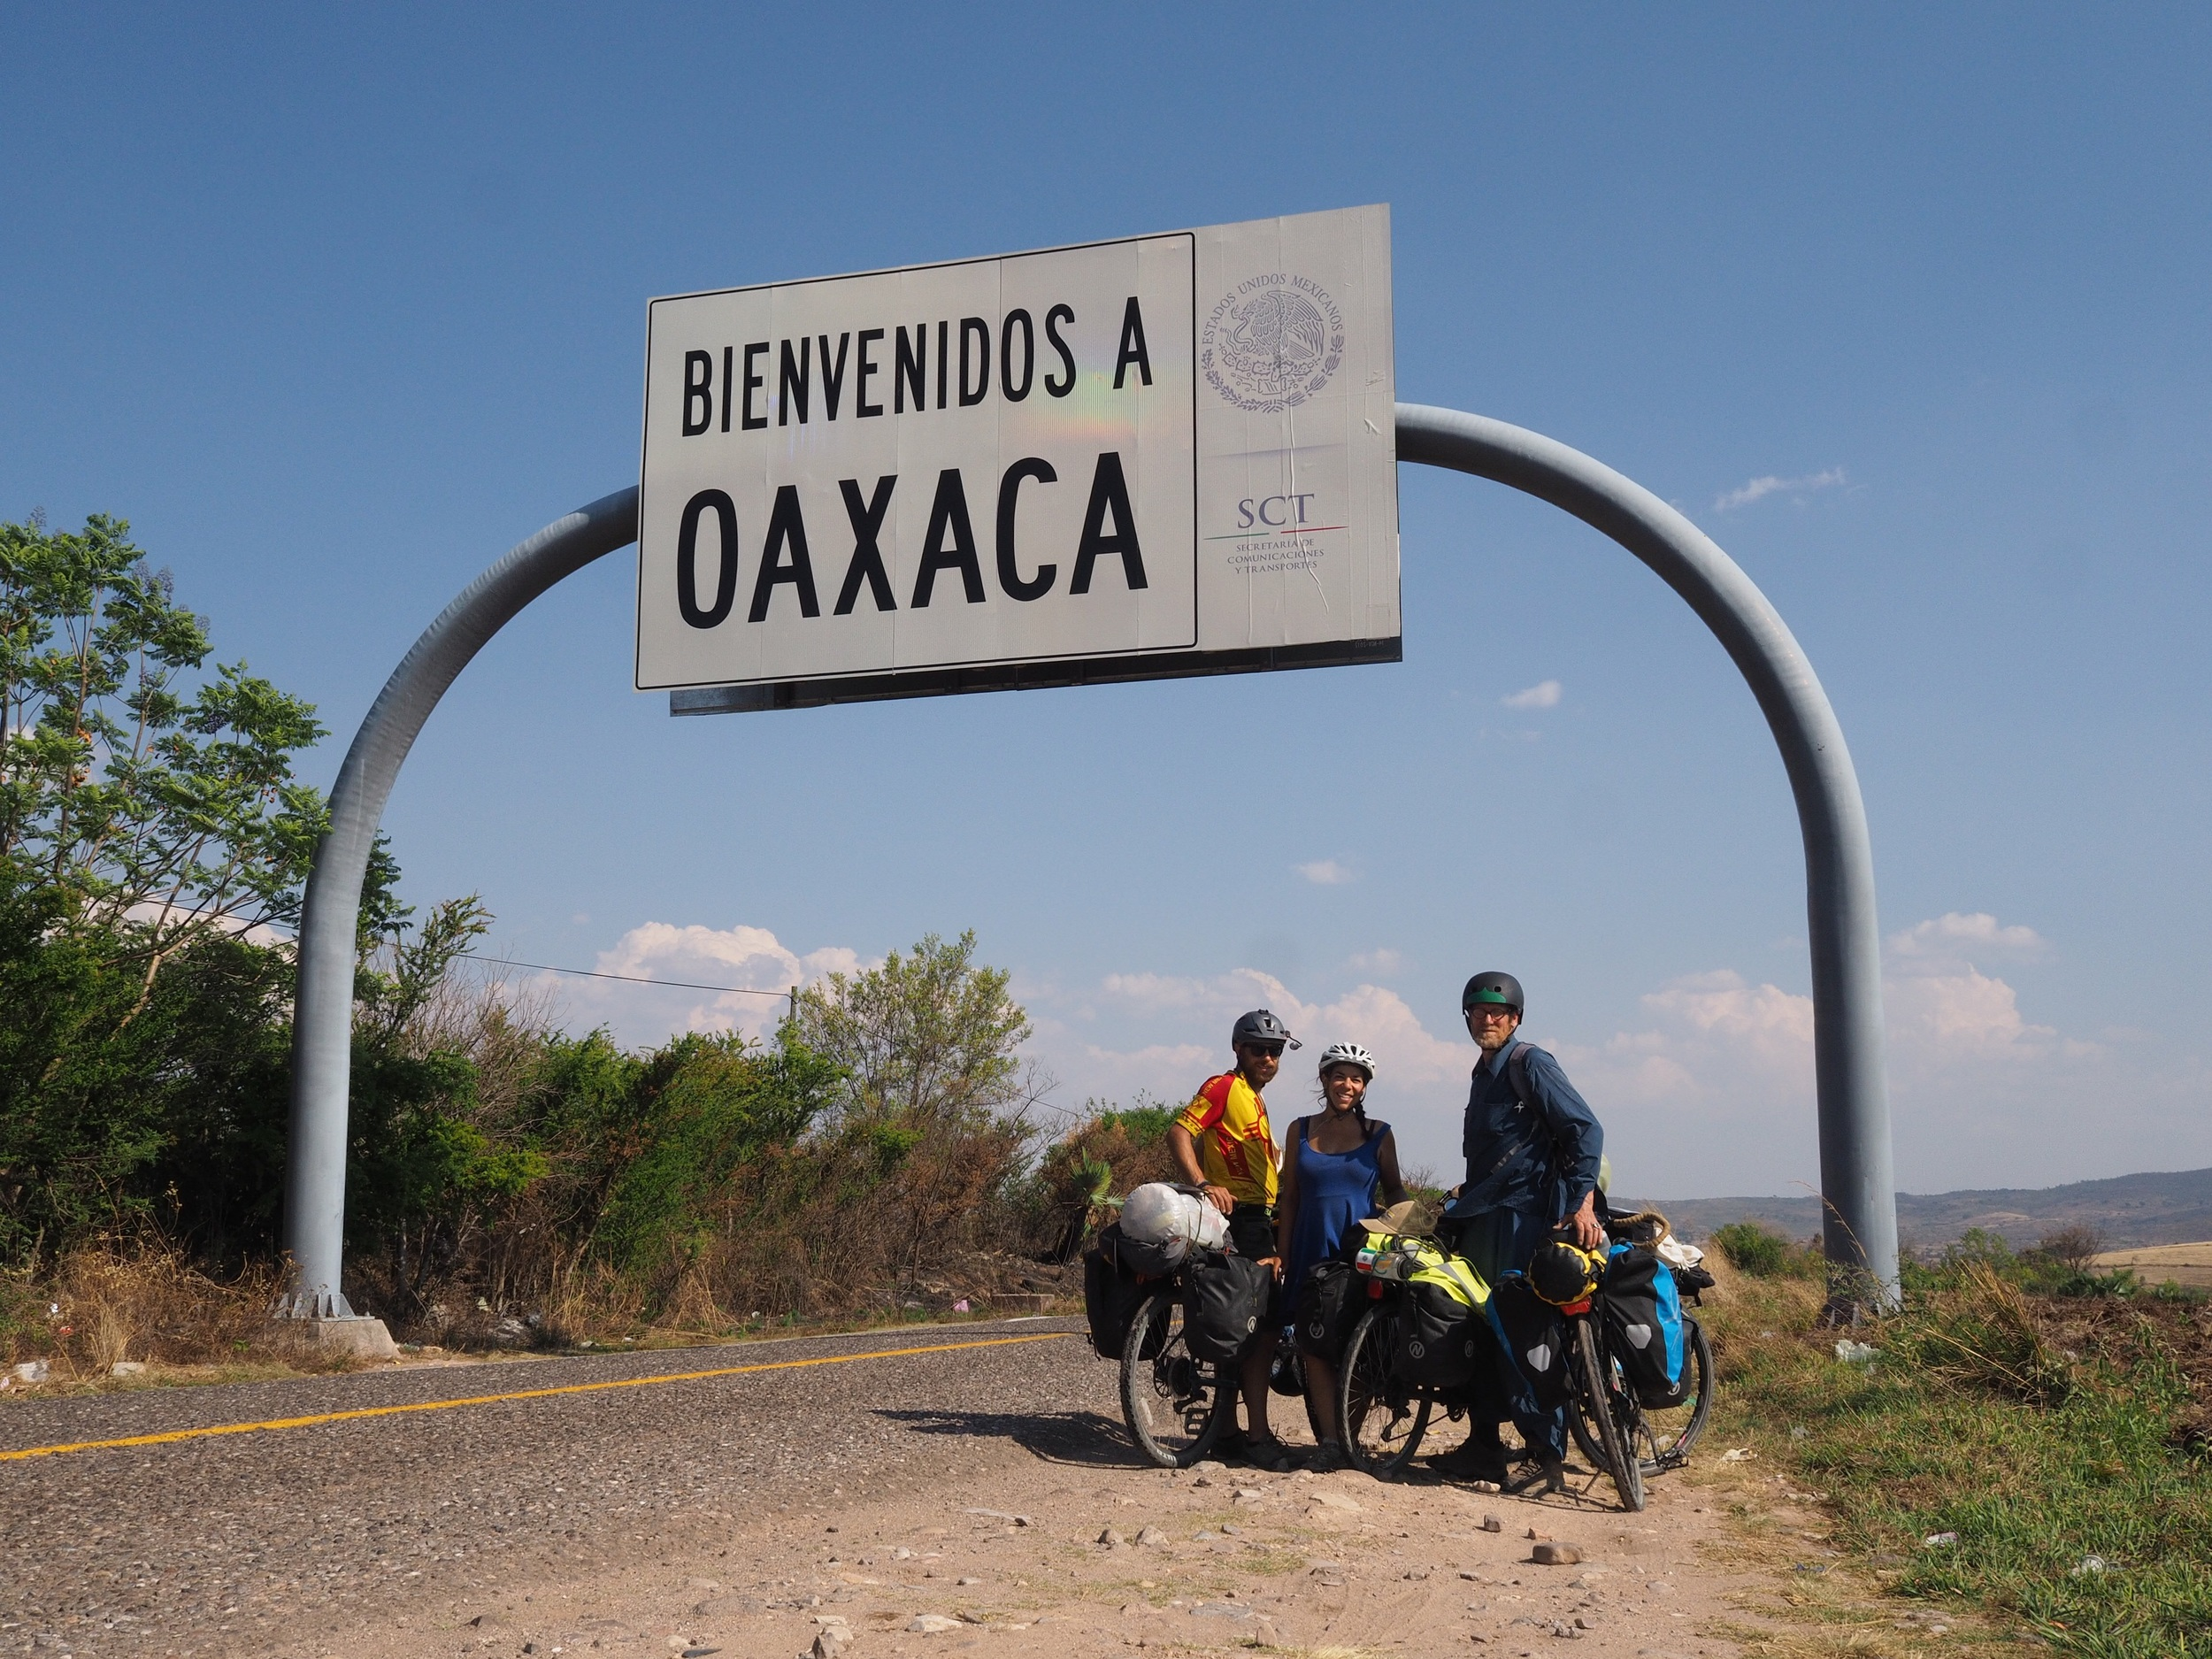 Crossing the state border into Oaxaca!